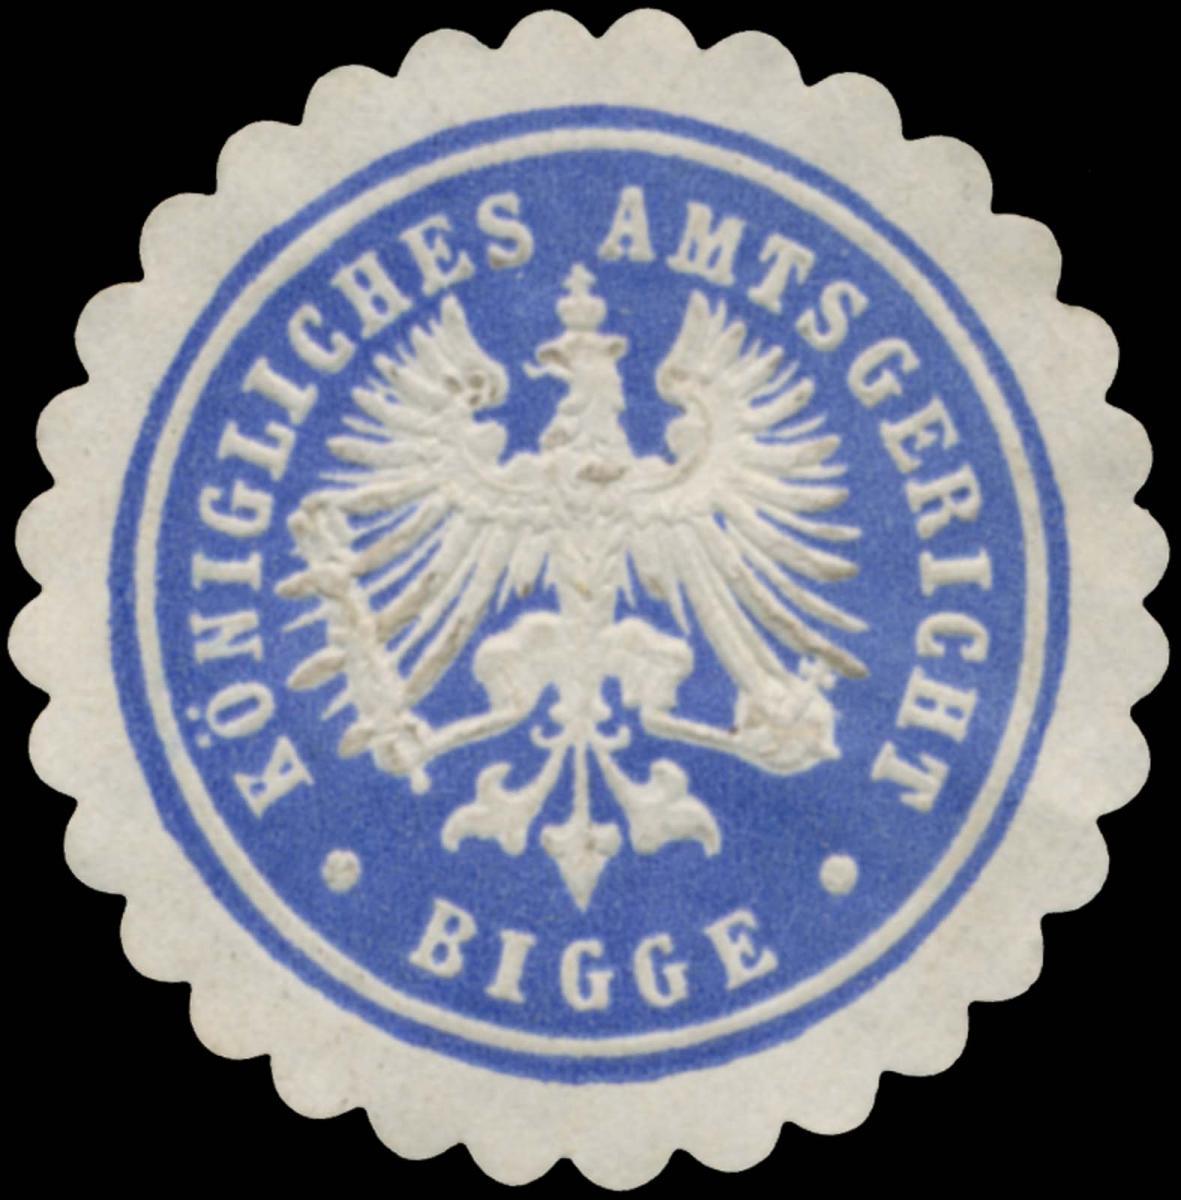 K. Amtsgericht Bigge